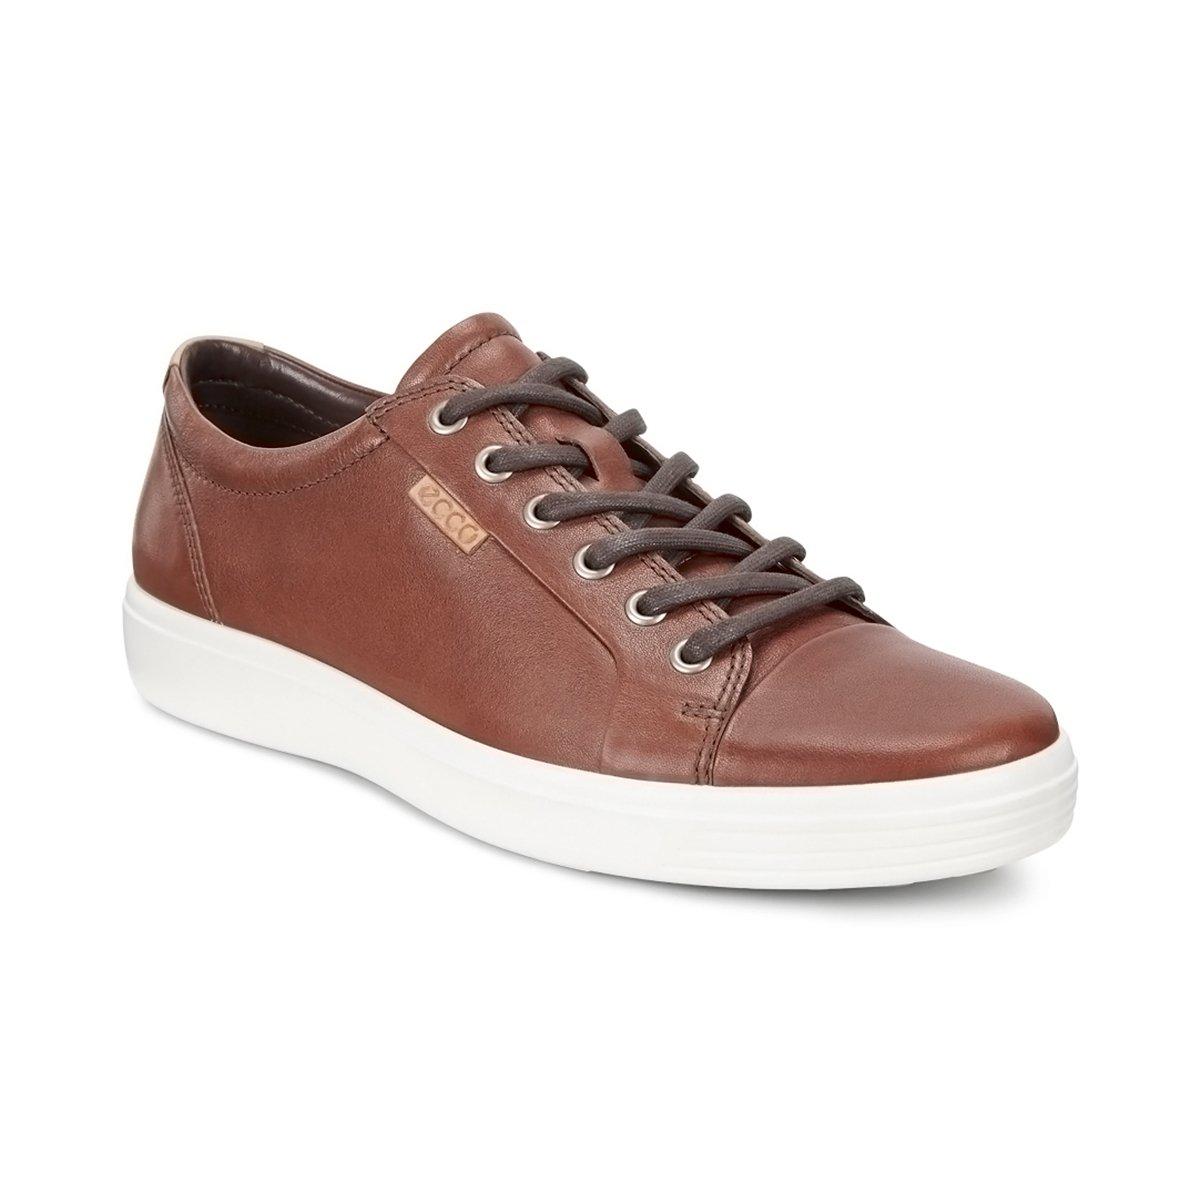 timeless design 95db4 75232 Herren Schuhe ECCO Herren Collin 2.0 Sneaker 53623455894